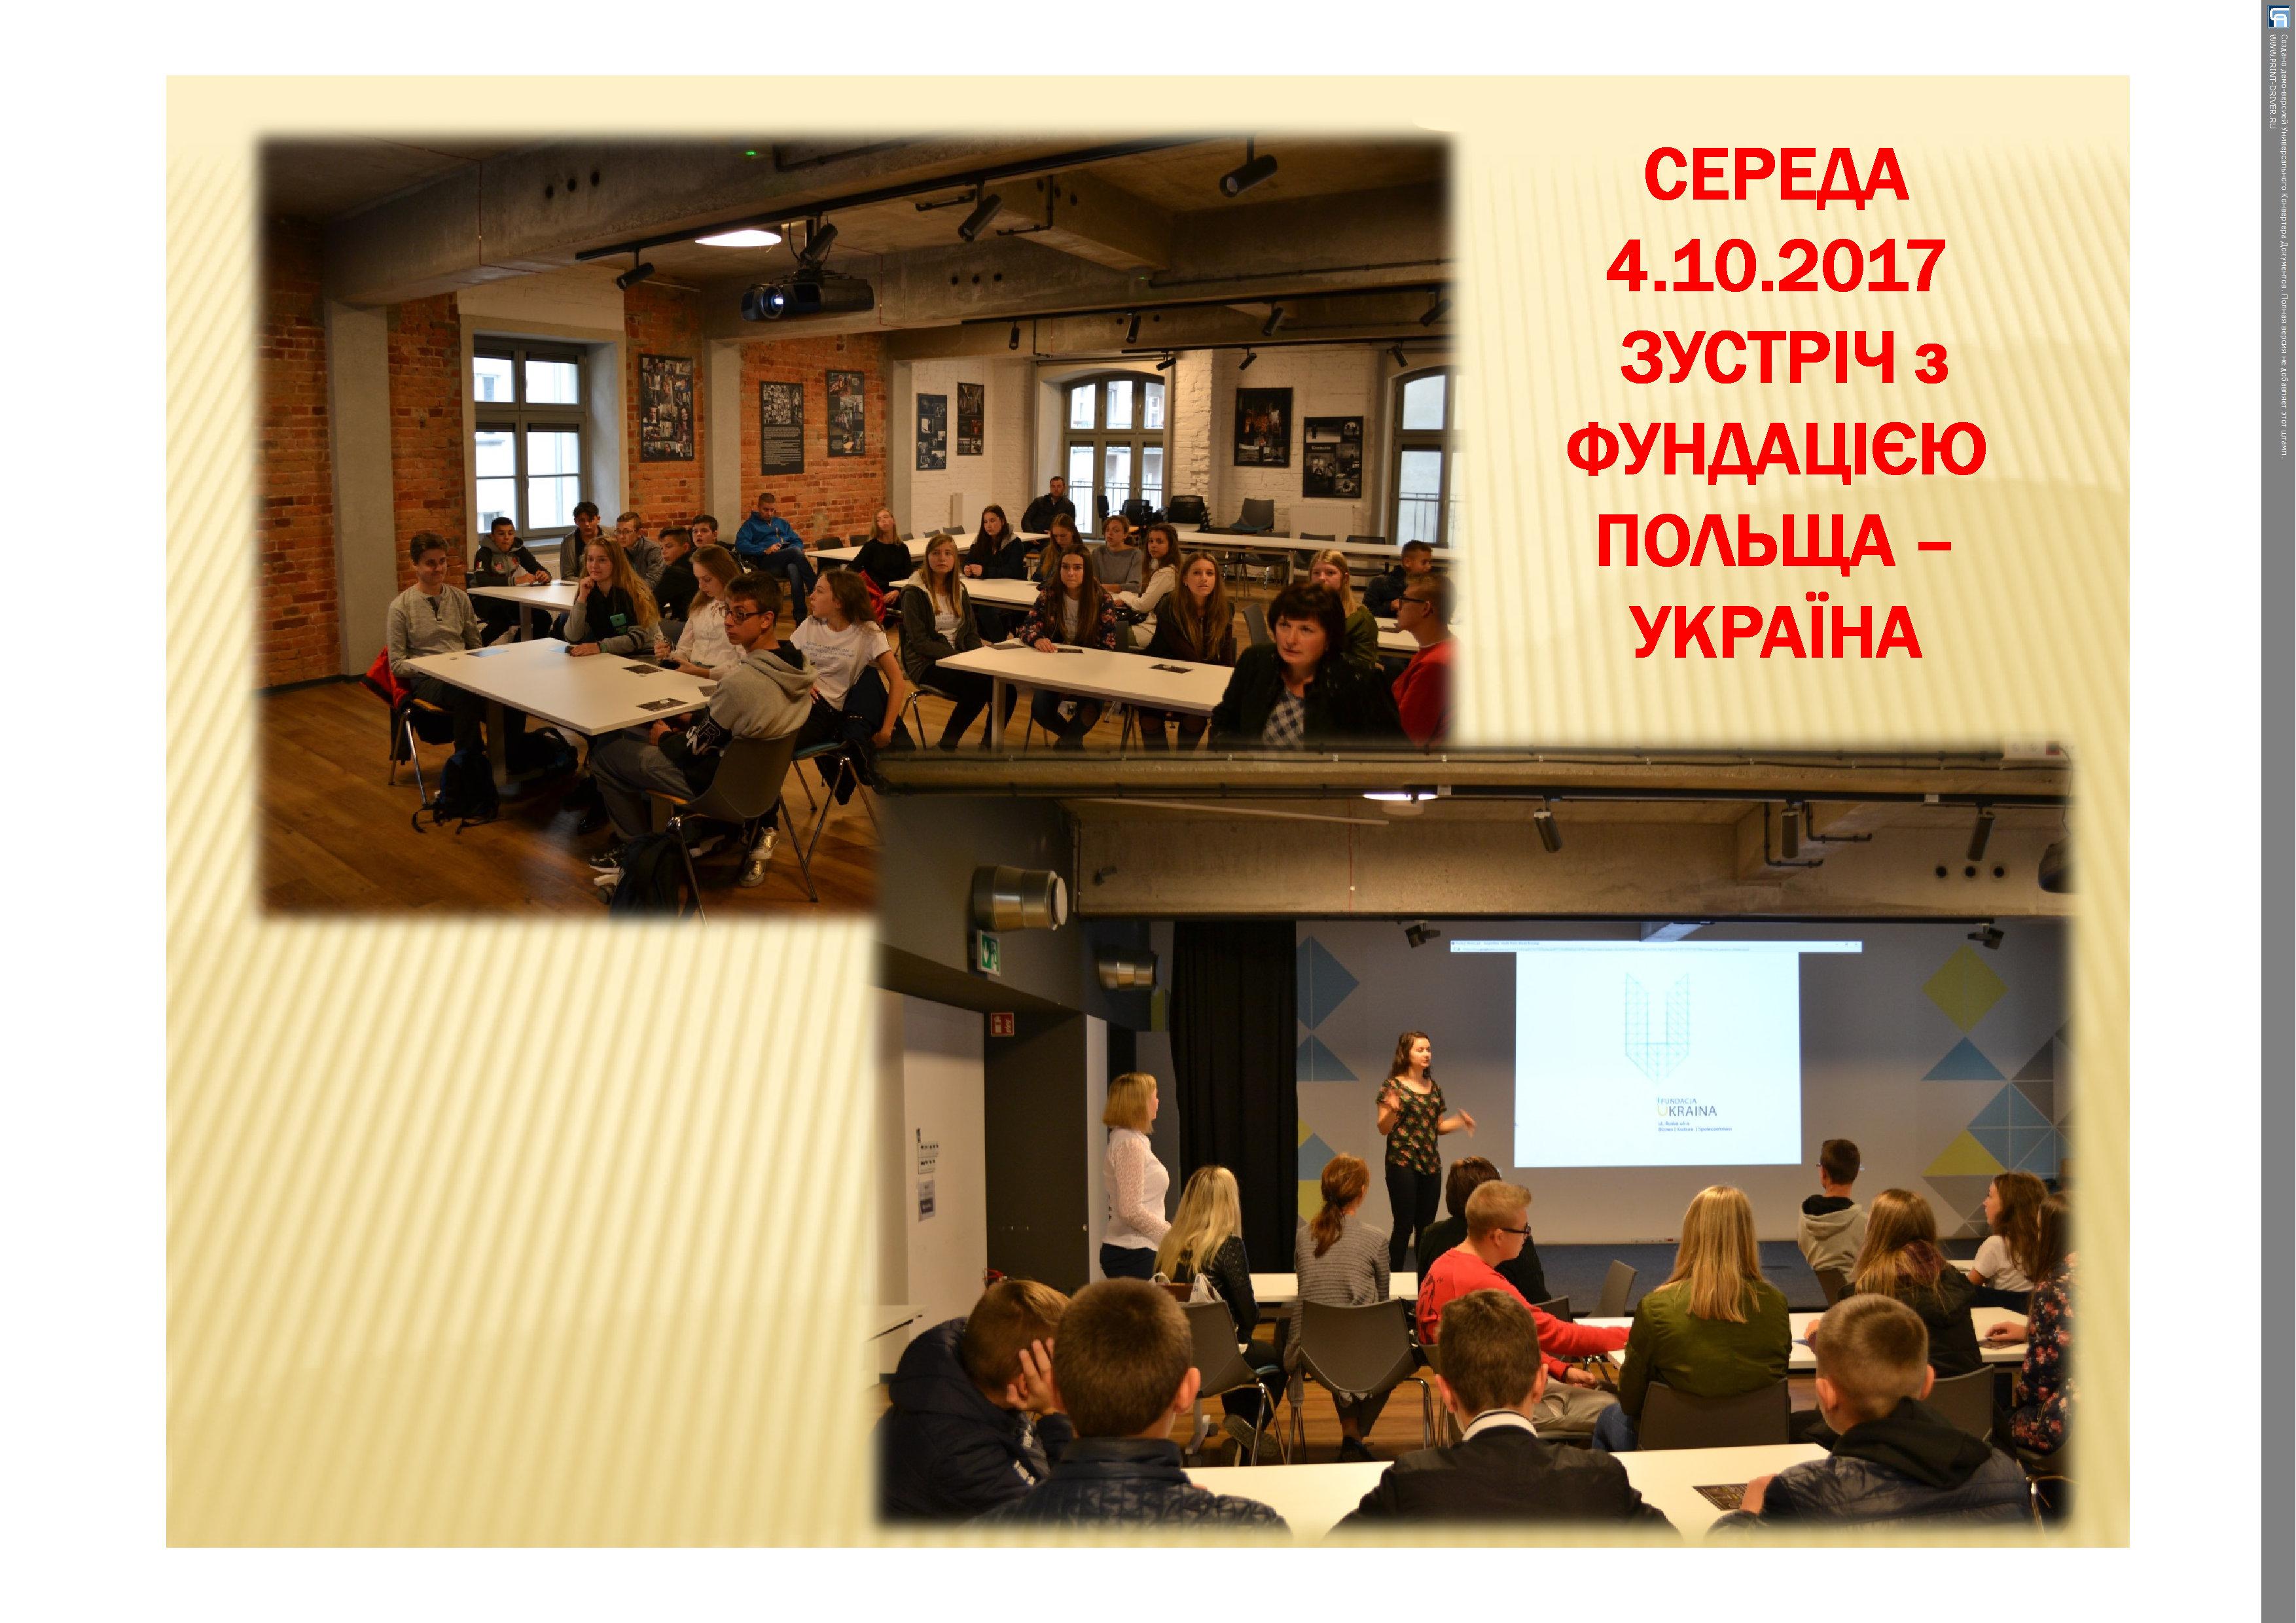 prezentacija-polshcha23